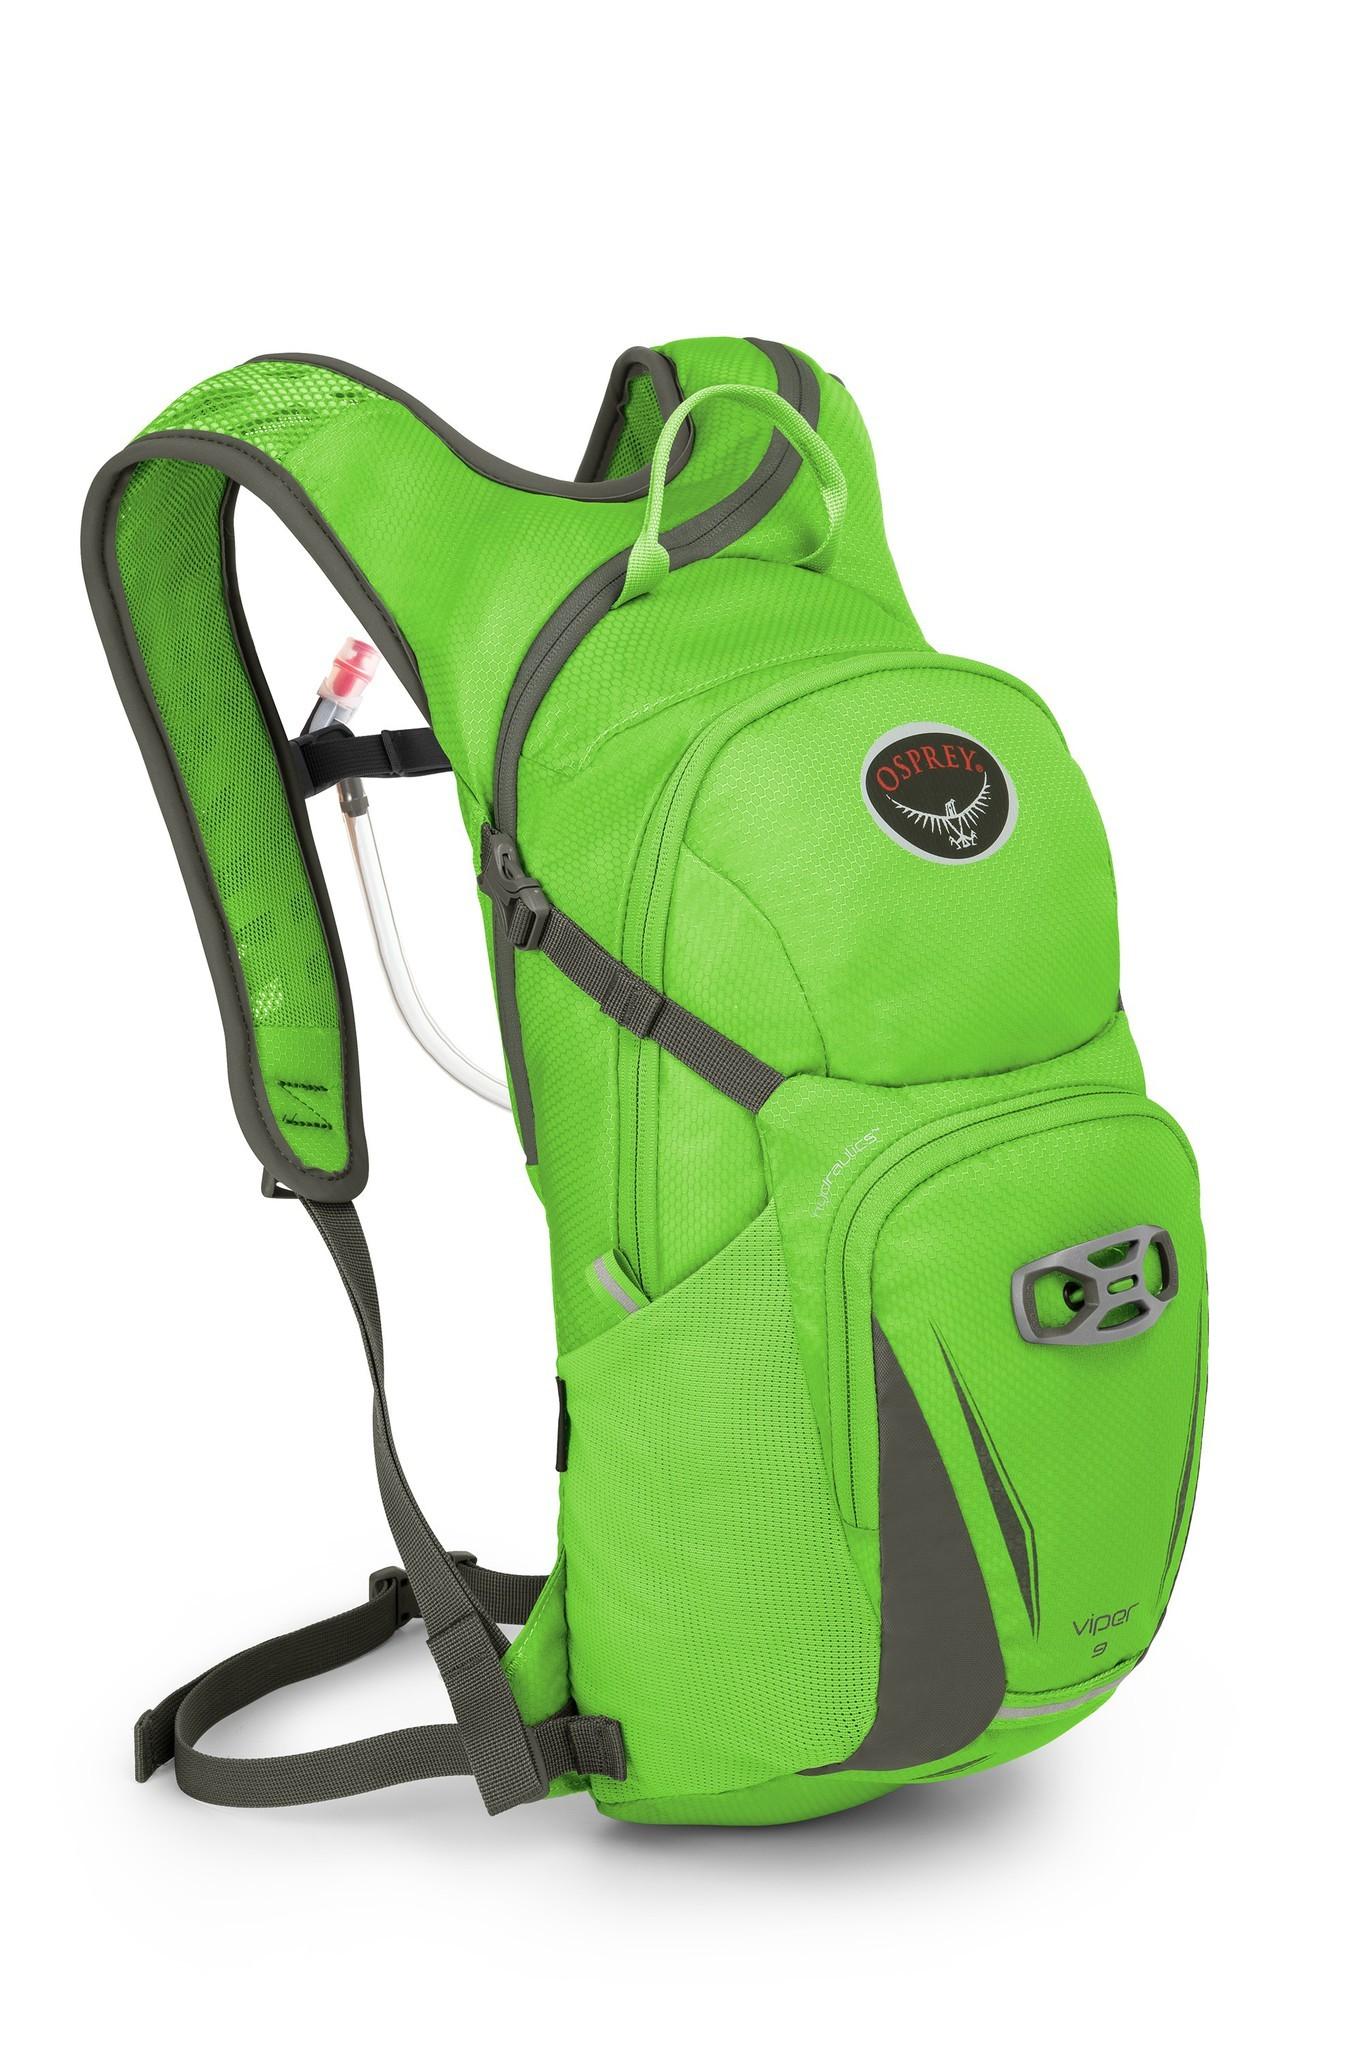 Велорюкзаки Велорюкзак Osprey Viper 9 New Bright green viper_9_wasabi_green_2000x3006px_1.jpg